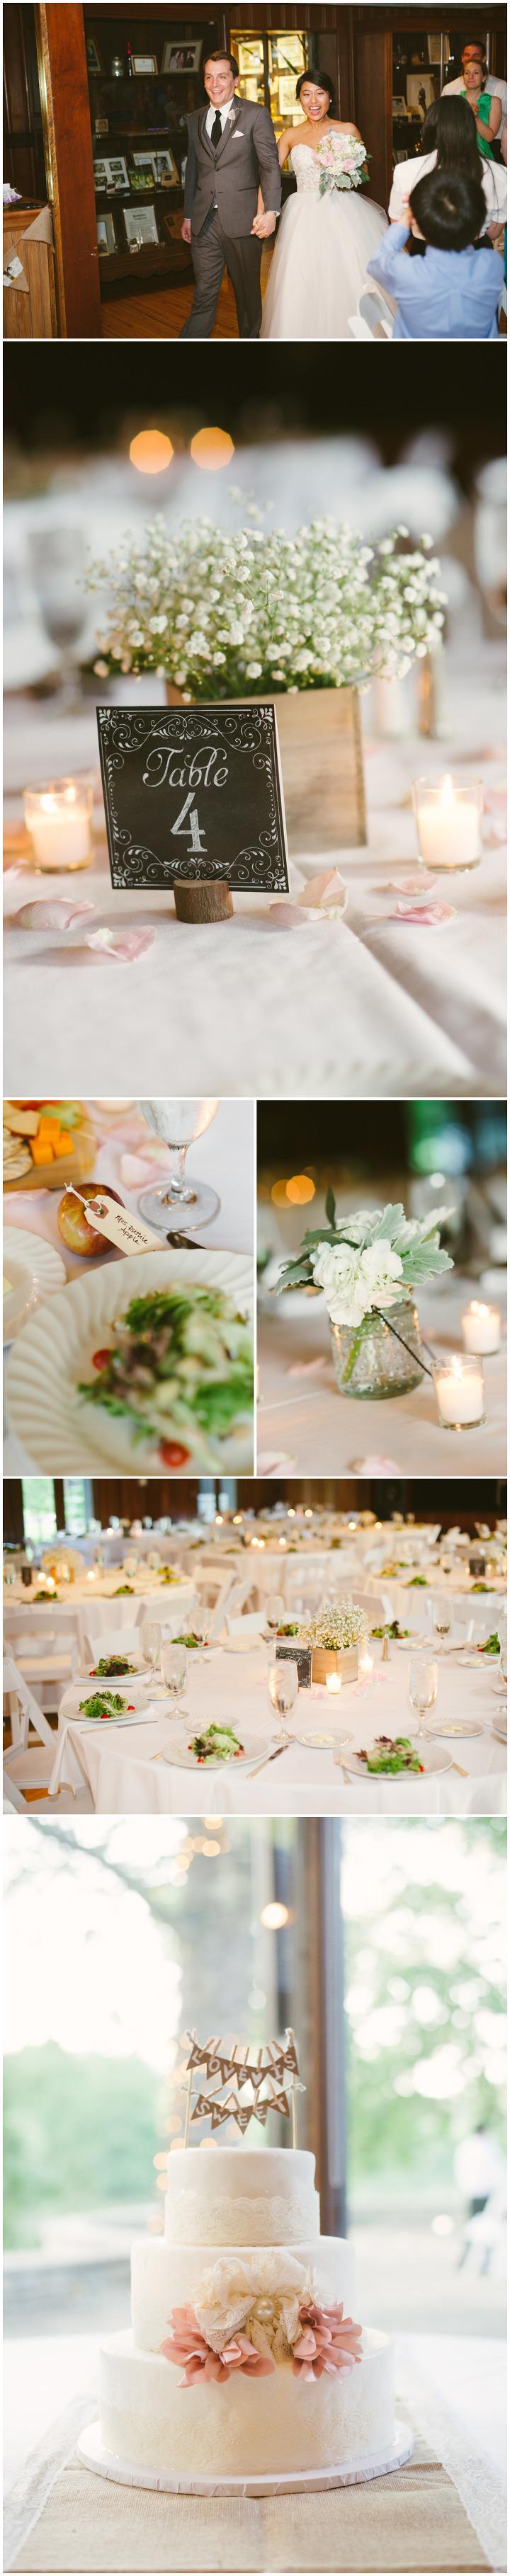 Blog Collage-Ruthie24